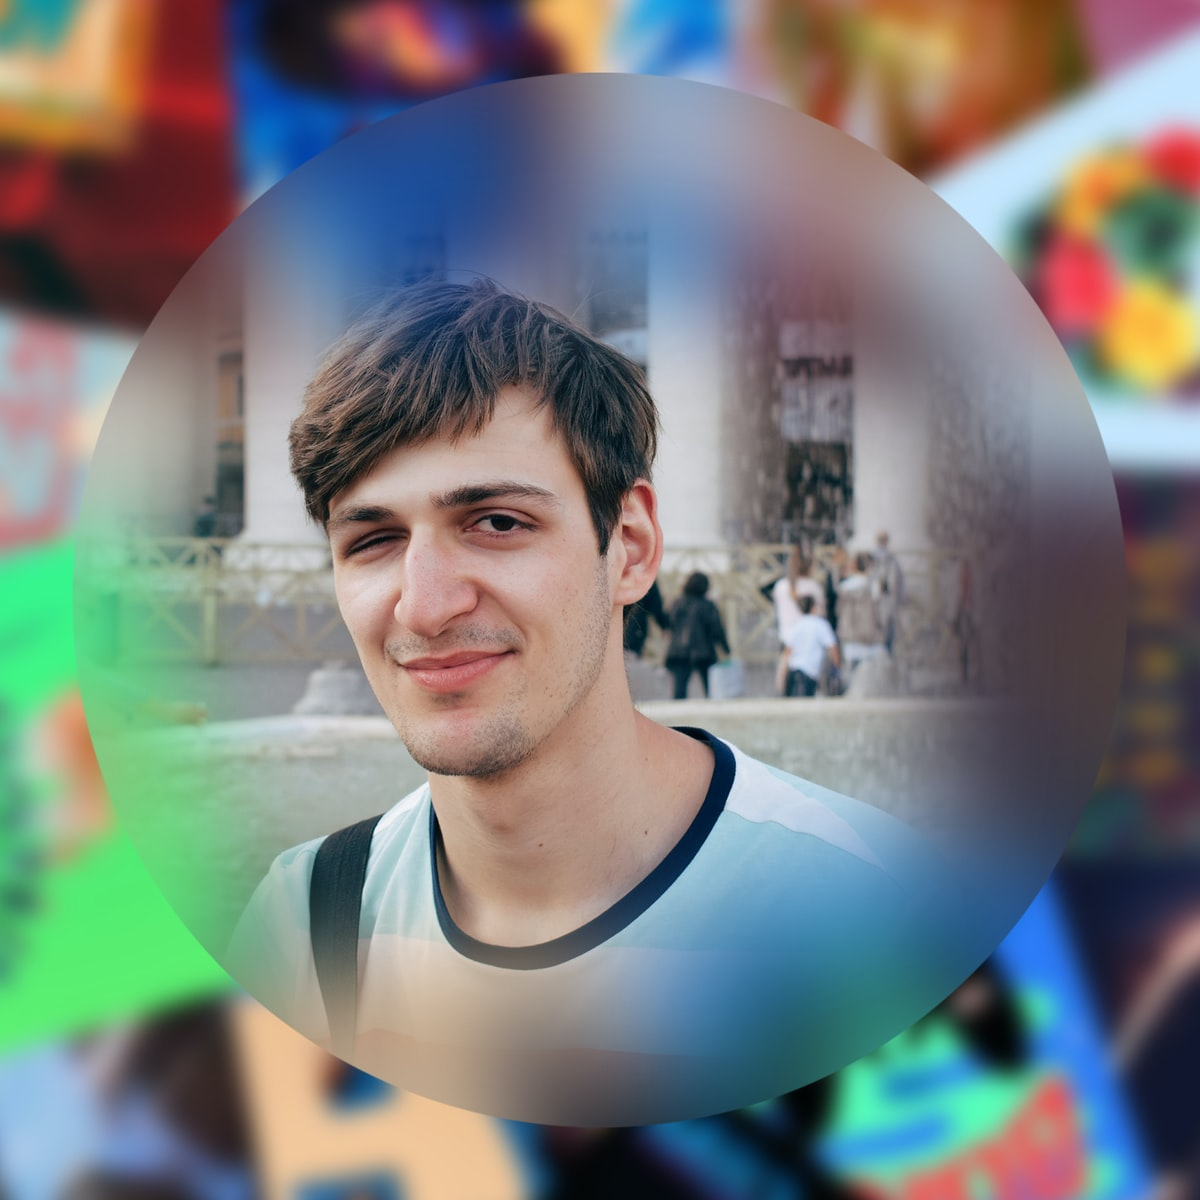 Go to Oliver Ulerich's profile